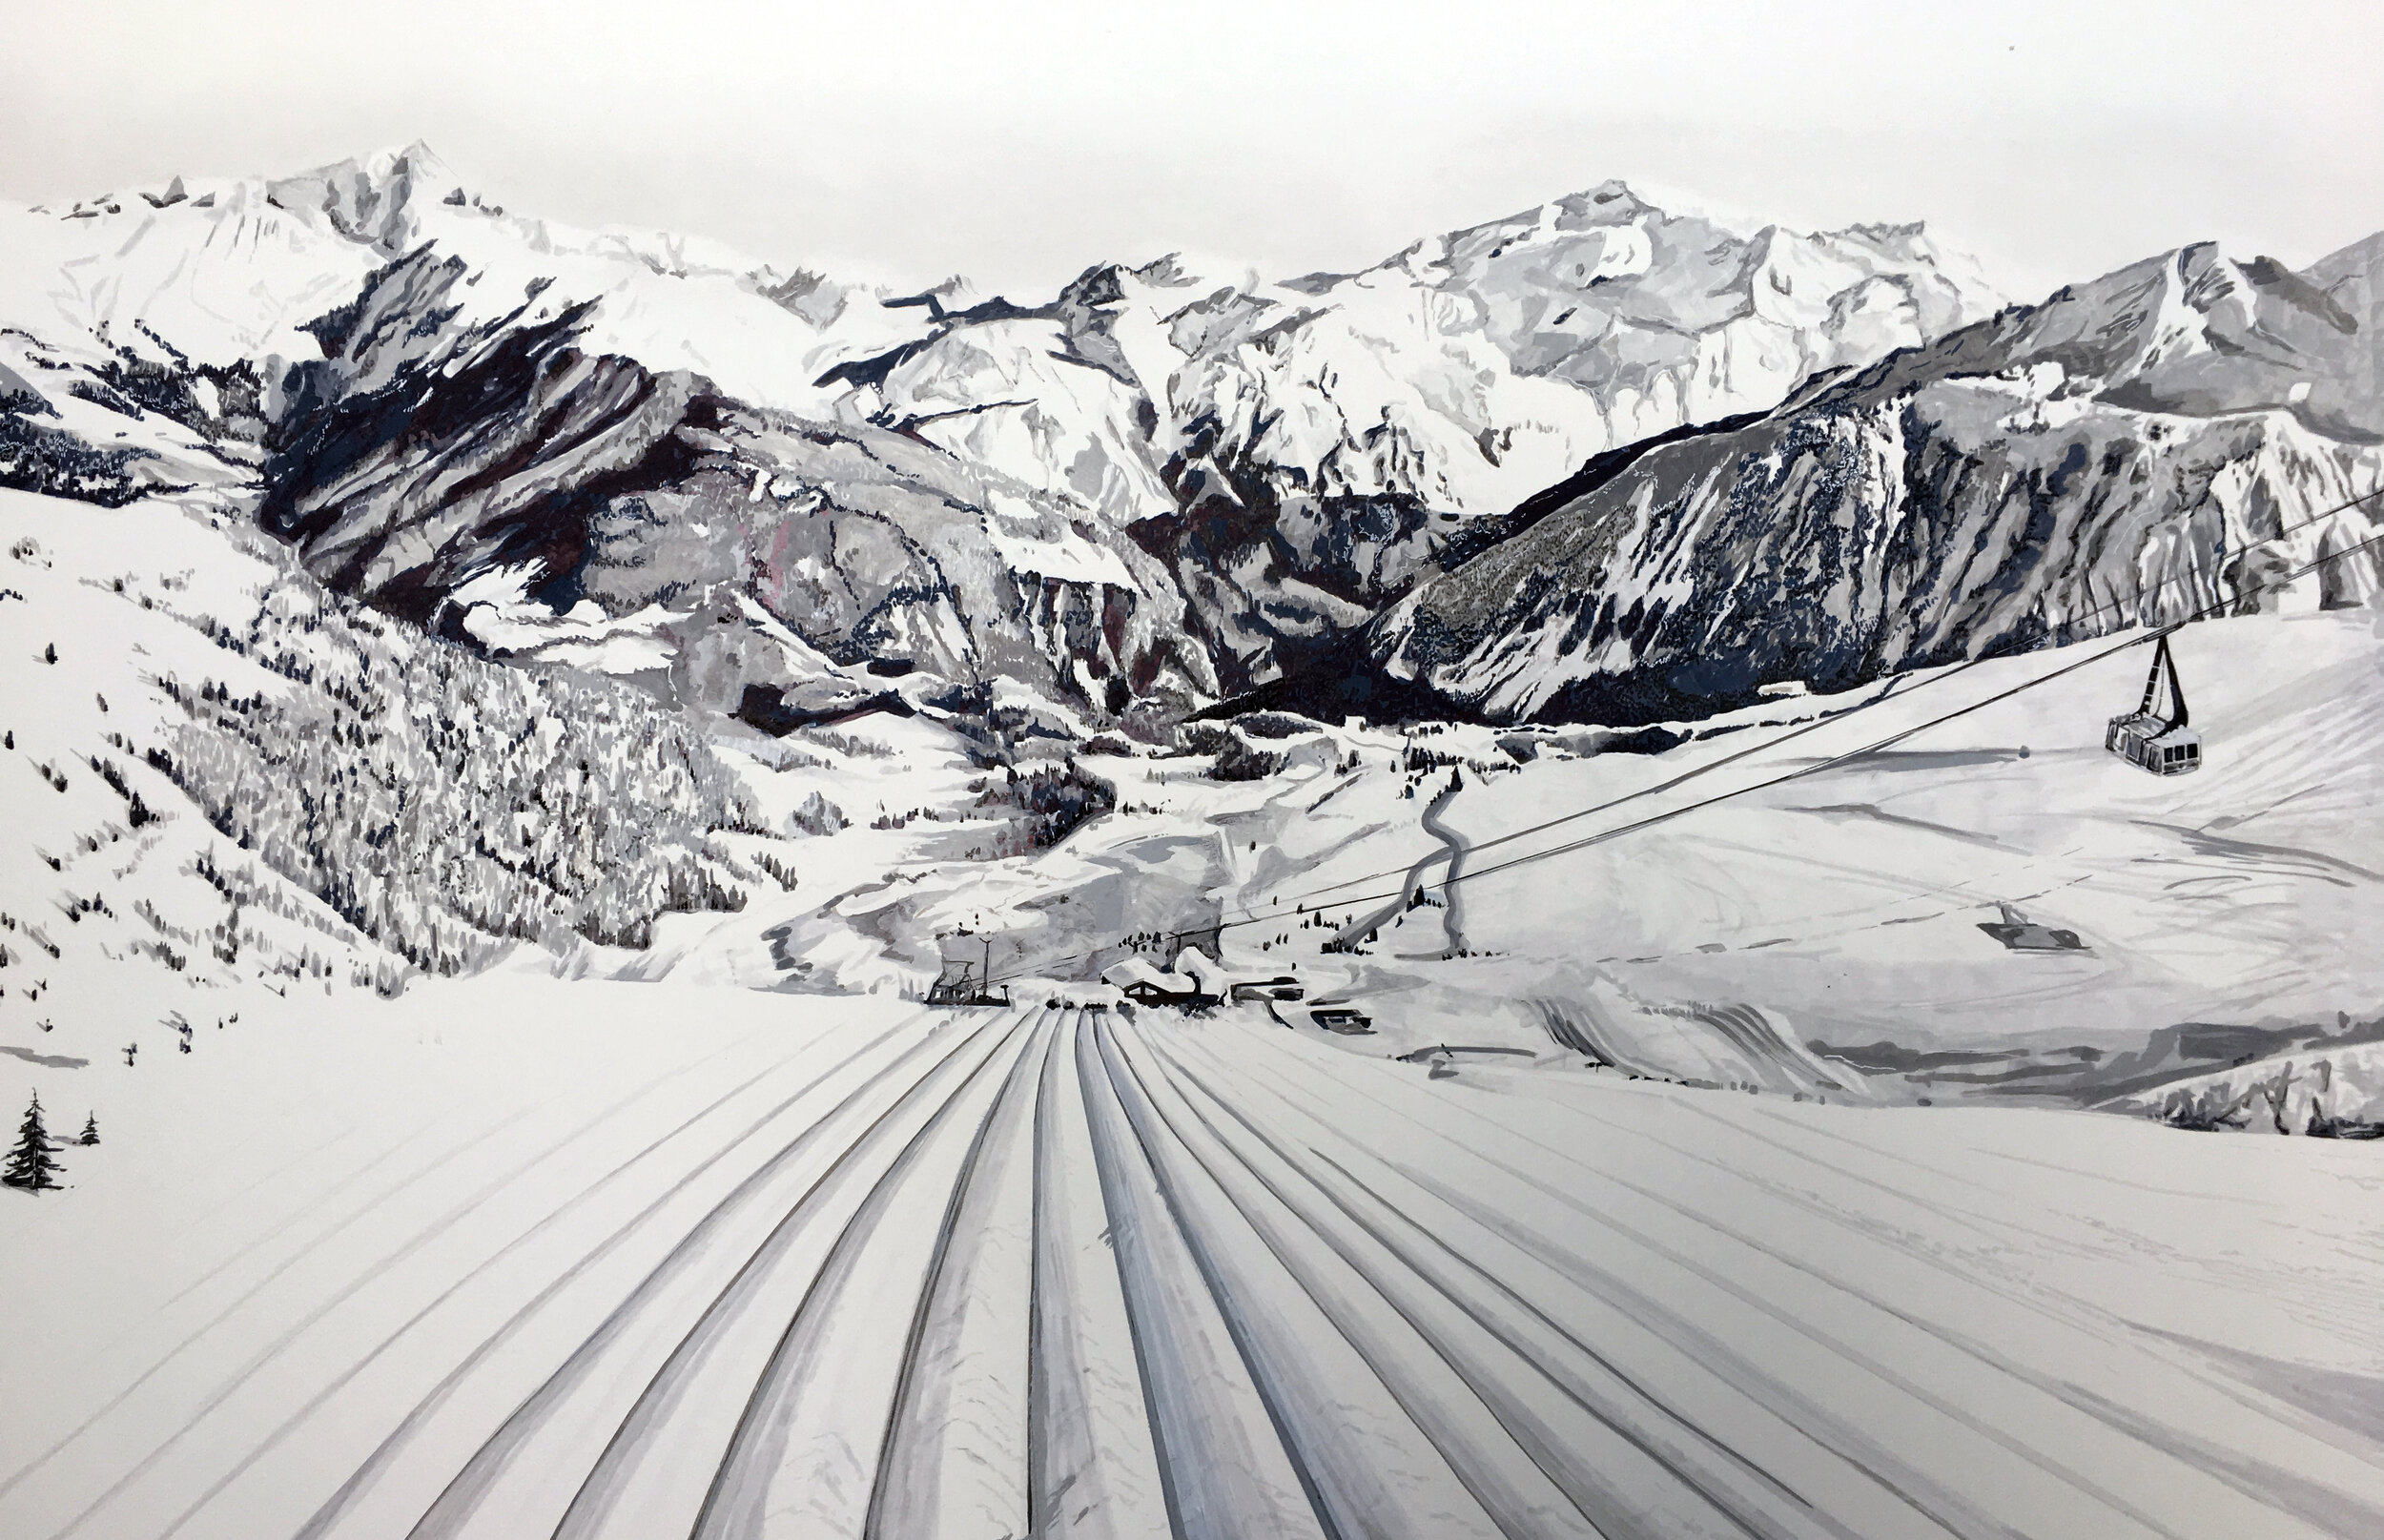 Courchevel, France, 1m x 1.5m, Pen, Paint Marker & Pastel on Mountboard, £3200.JPG